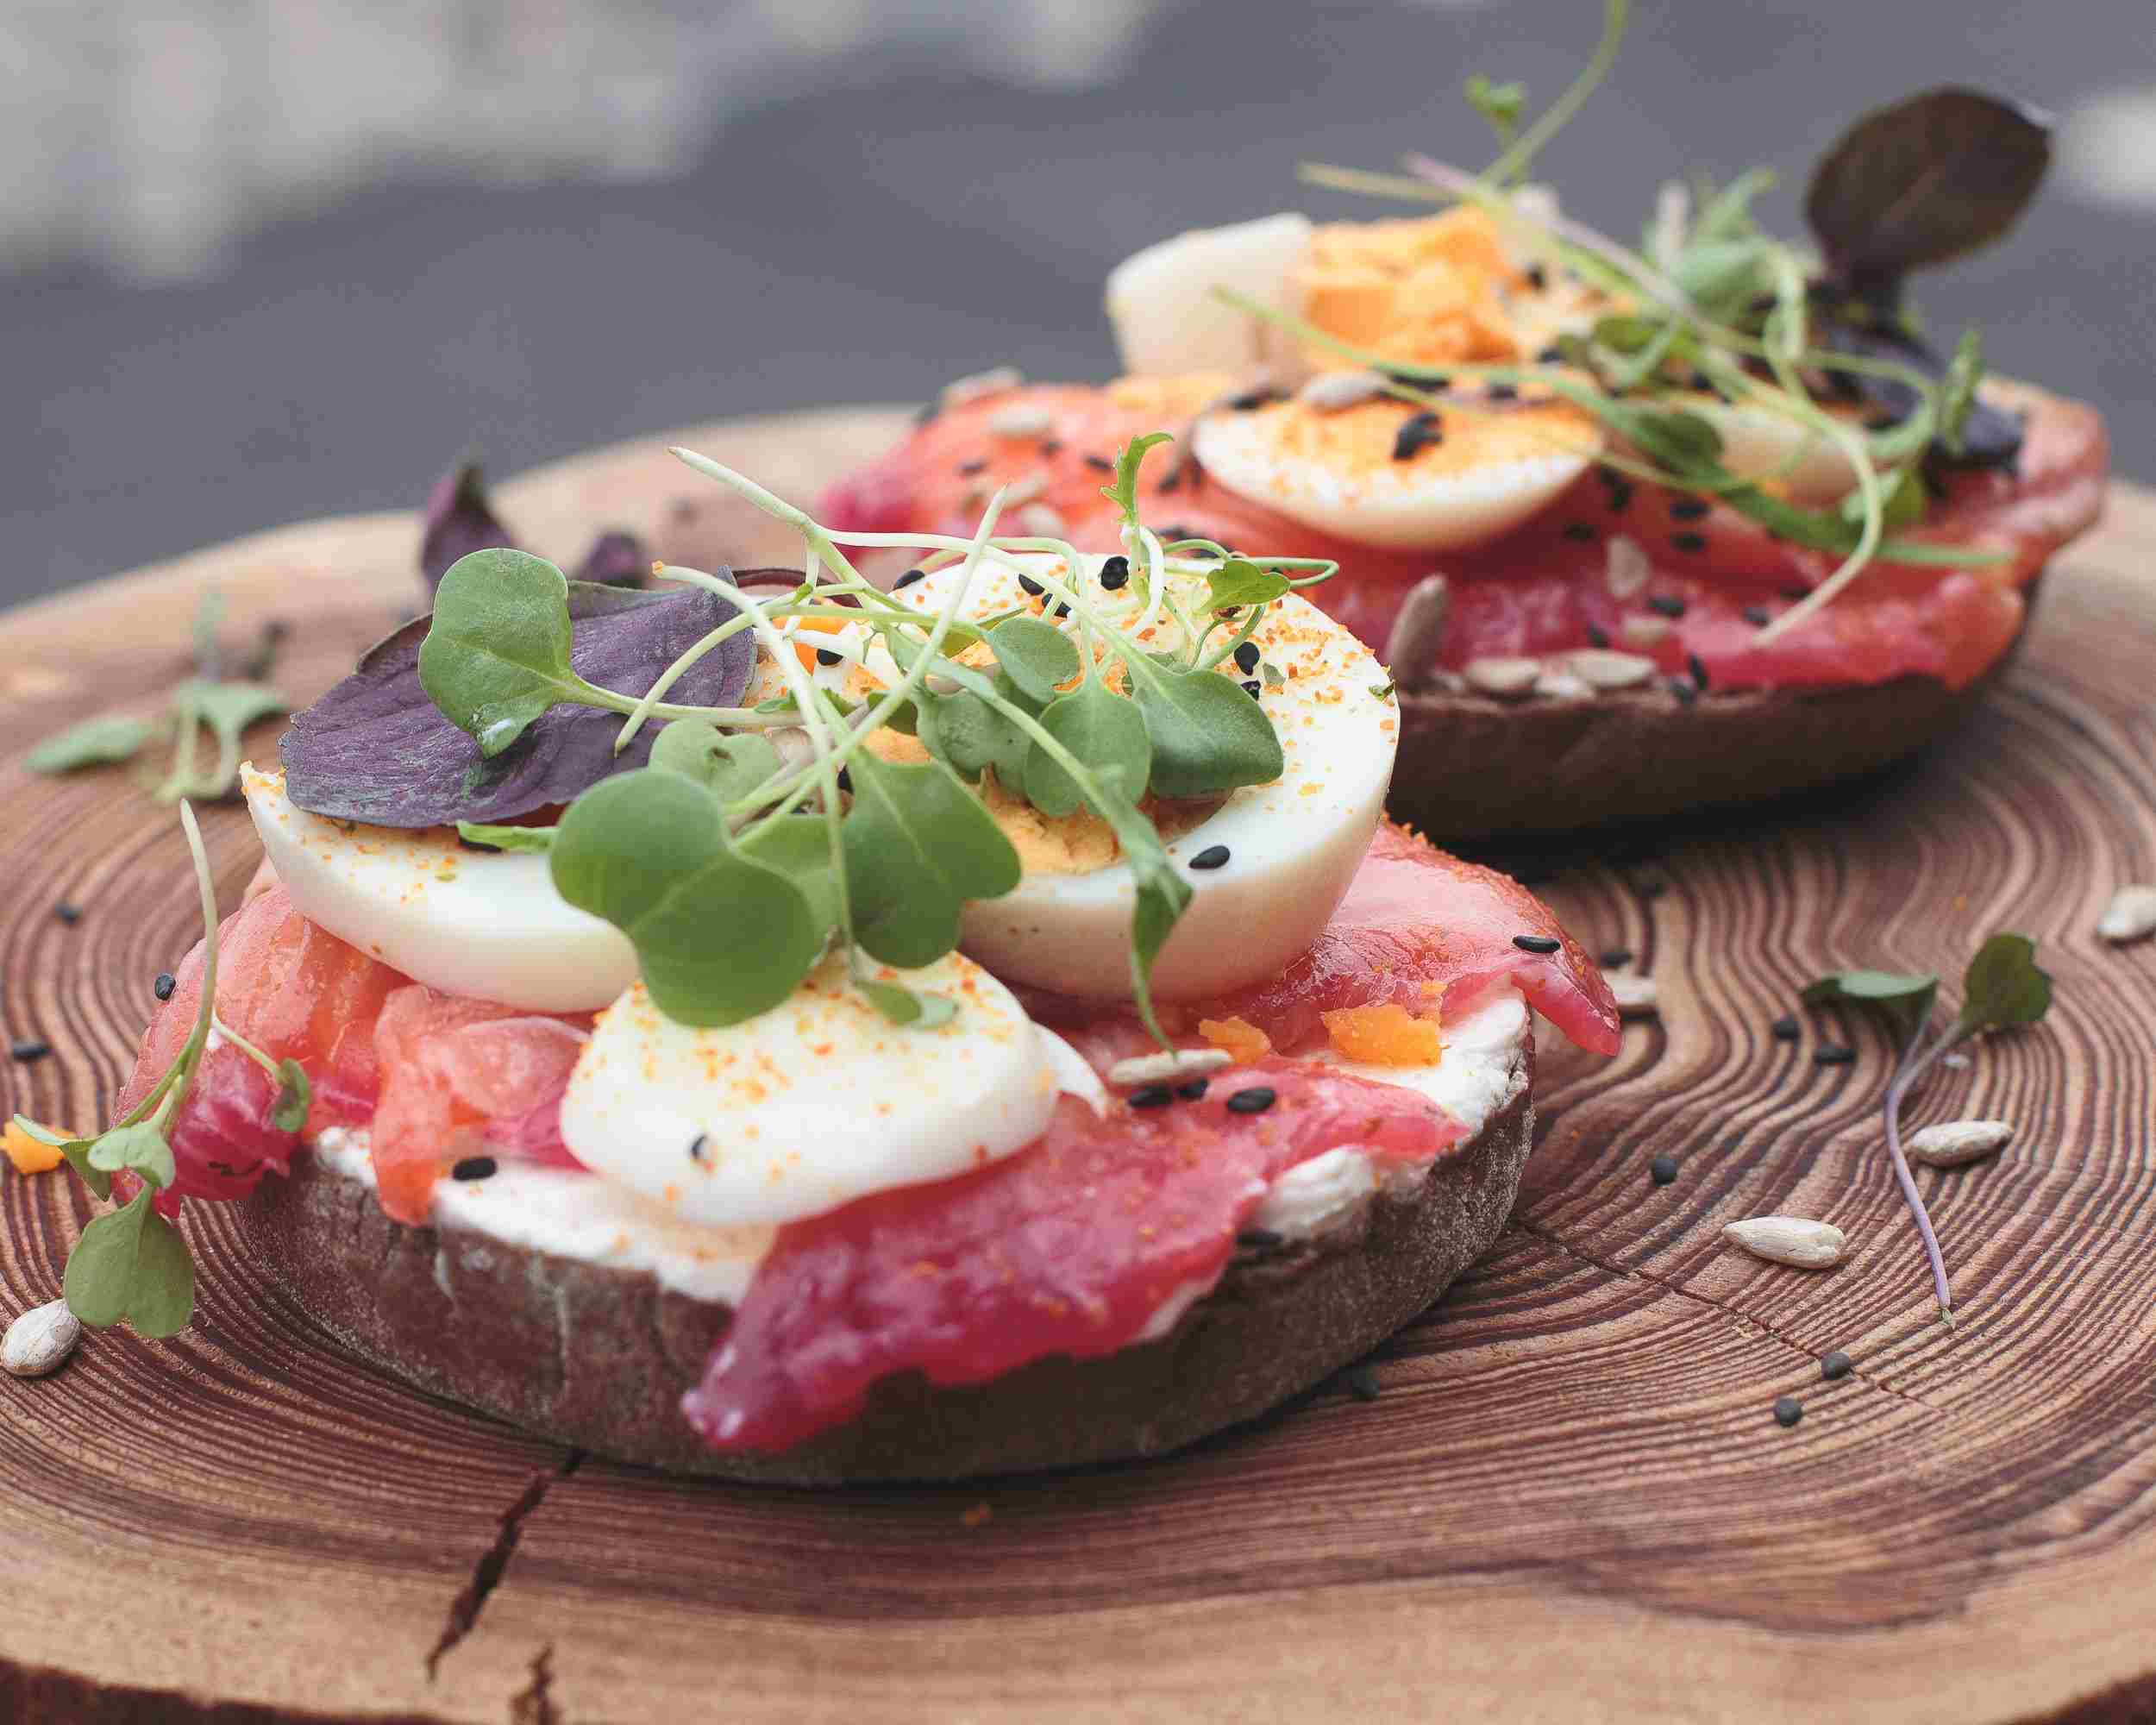 Salmon and egg sandwich on a tree stump platter.